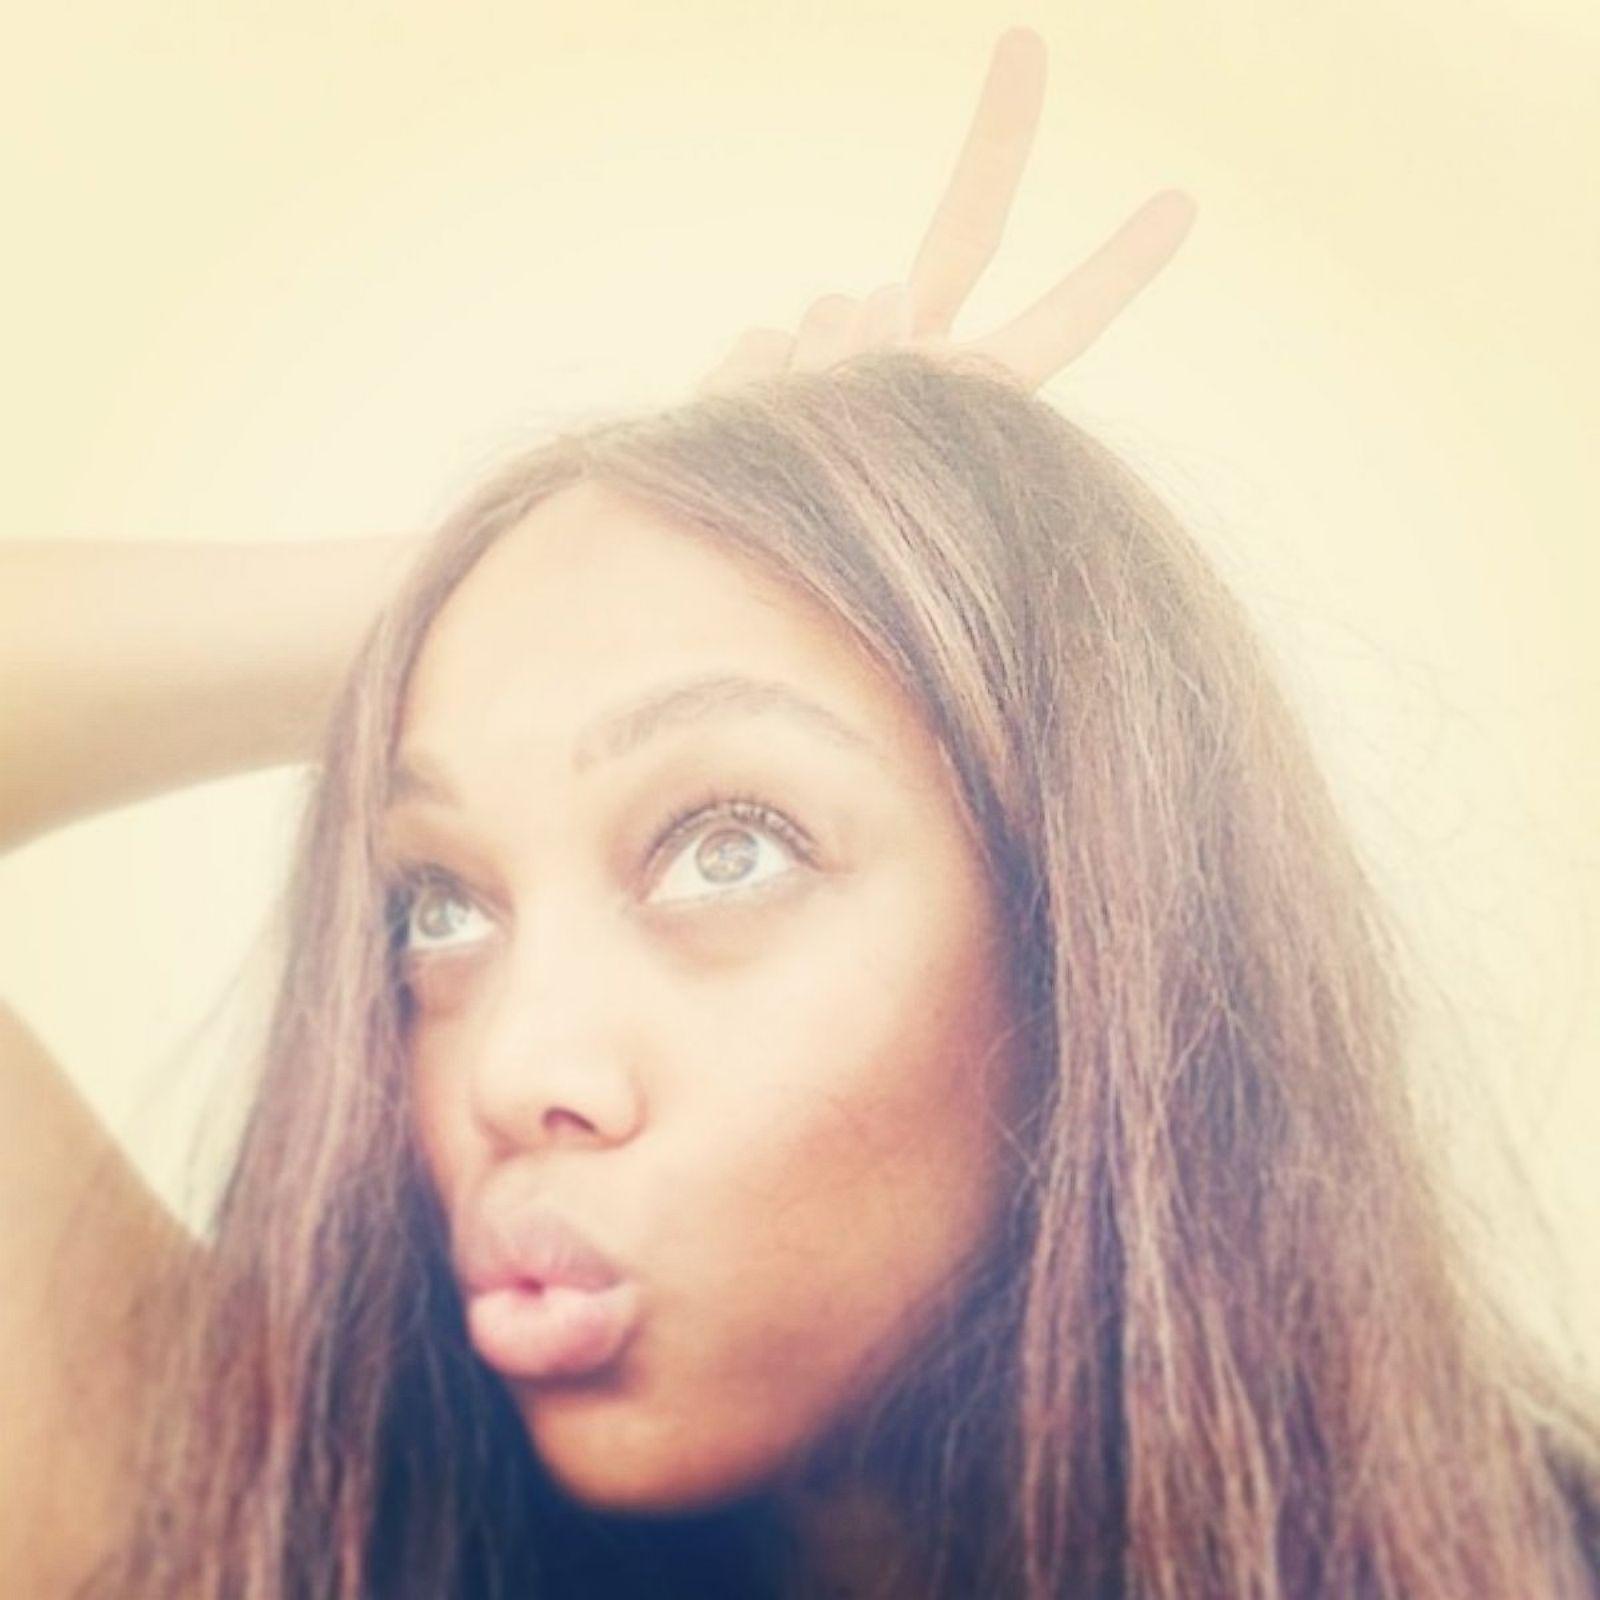 Tyra Banks Without Makeup: Tyra Banks Goes Makeup-Free Picture